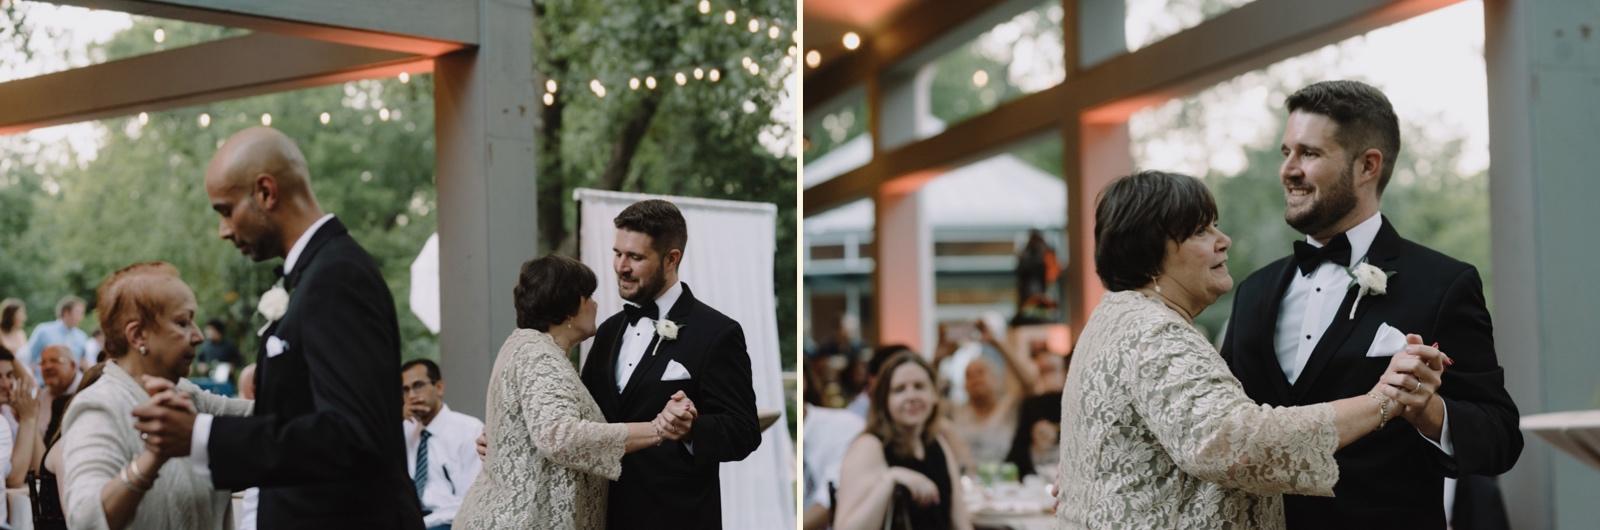 Father mother dance at a same sex wedding at the Umlauf Sculpture Garden in Austin